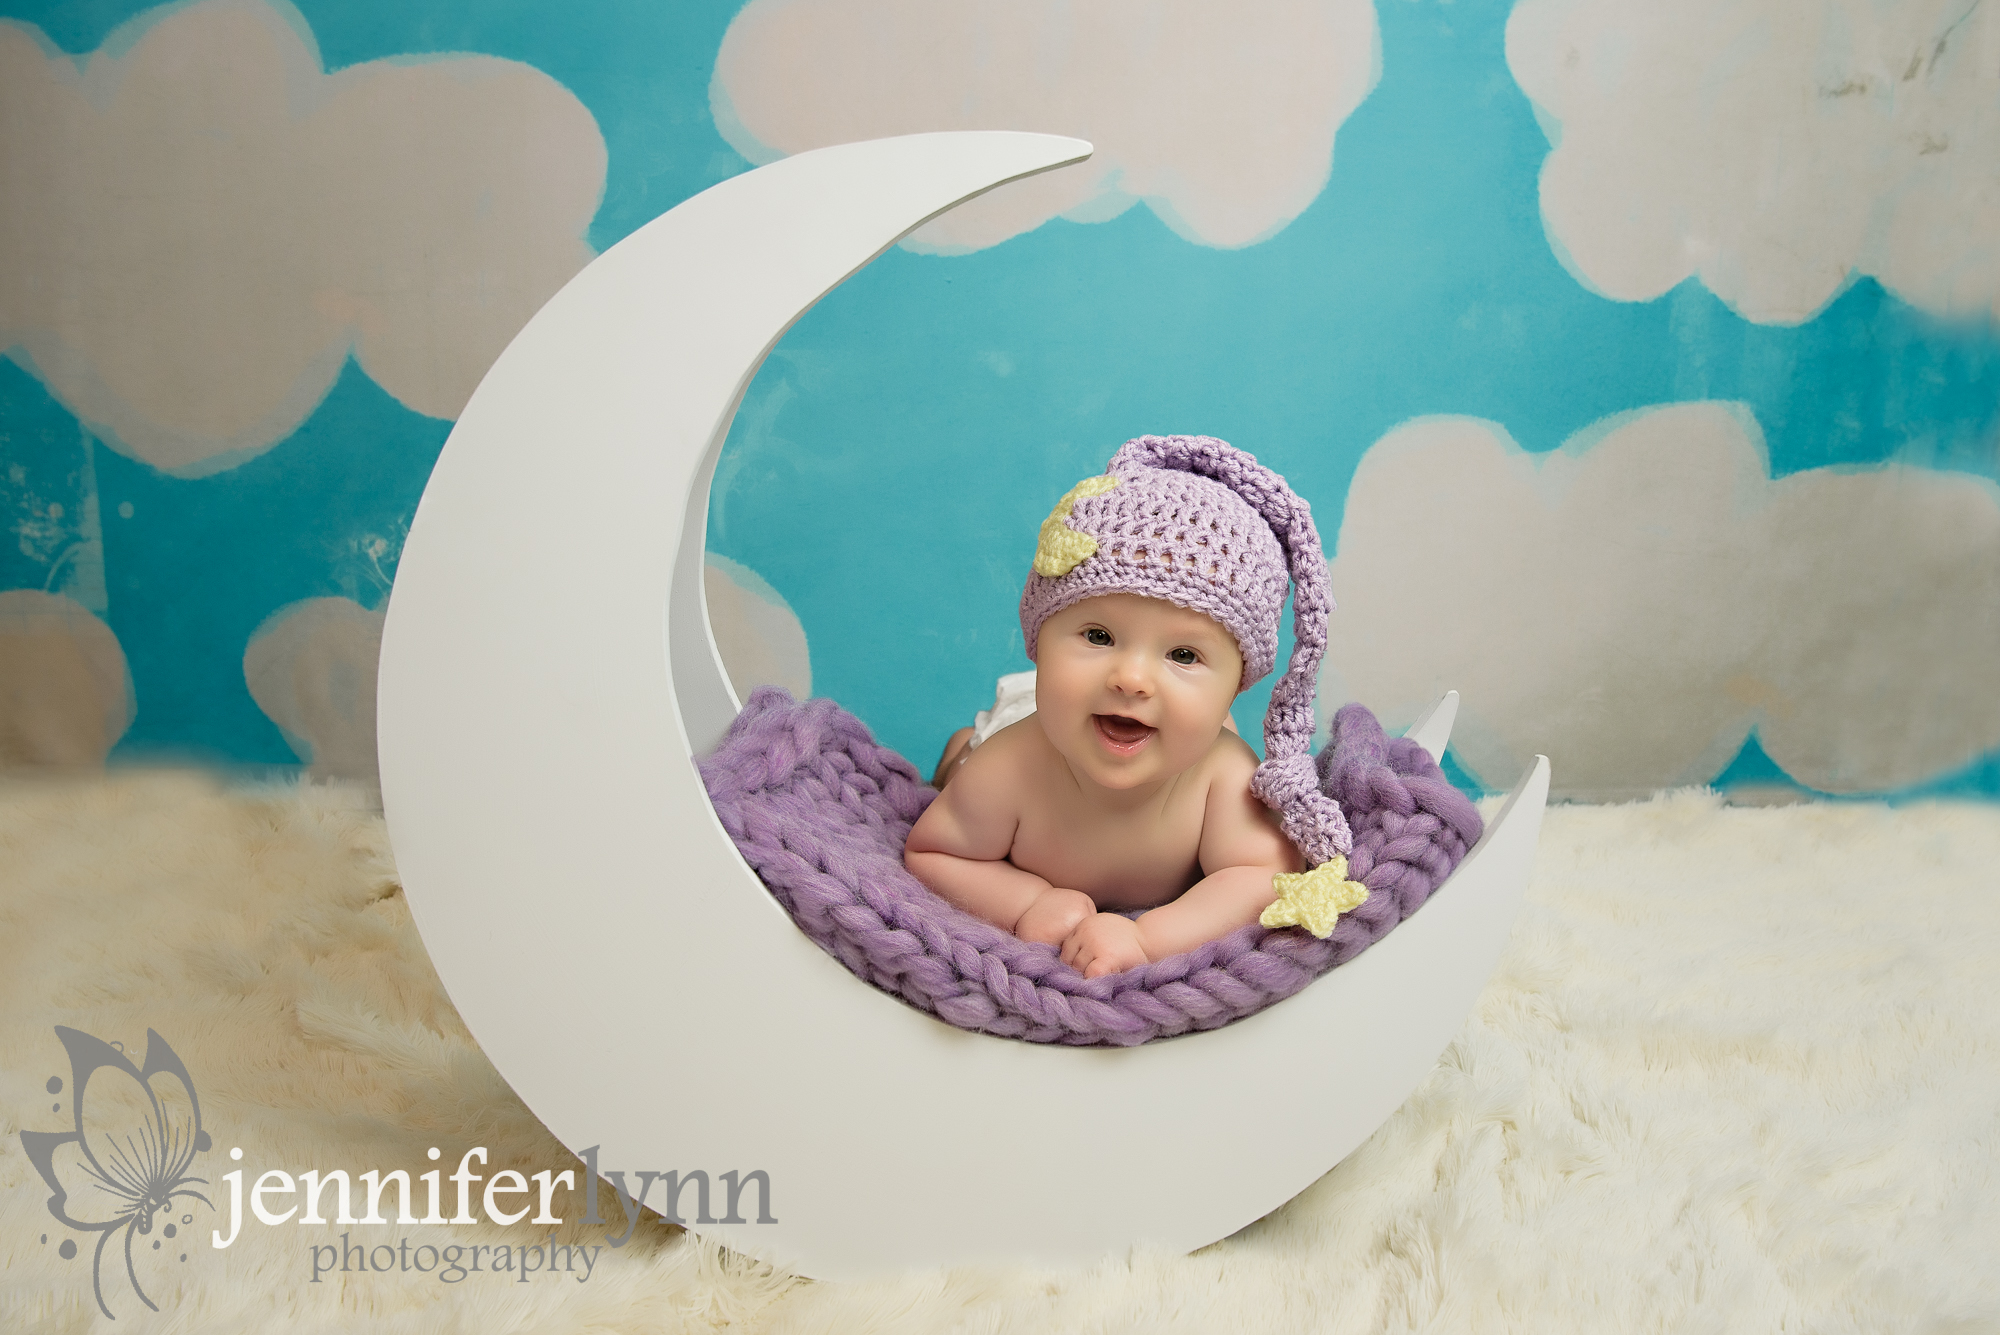 Photo 8: Emma Baby